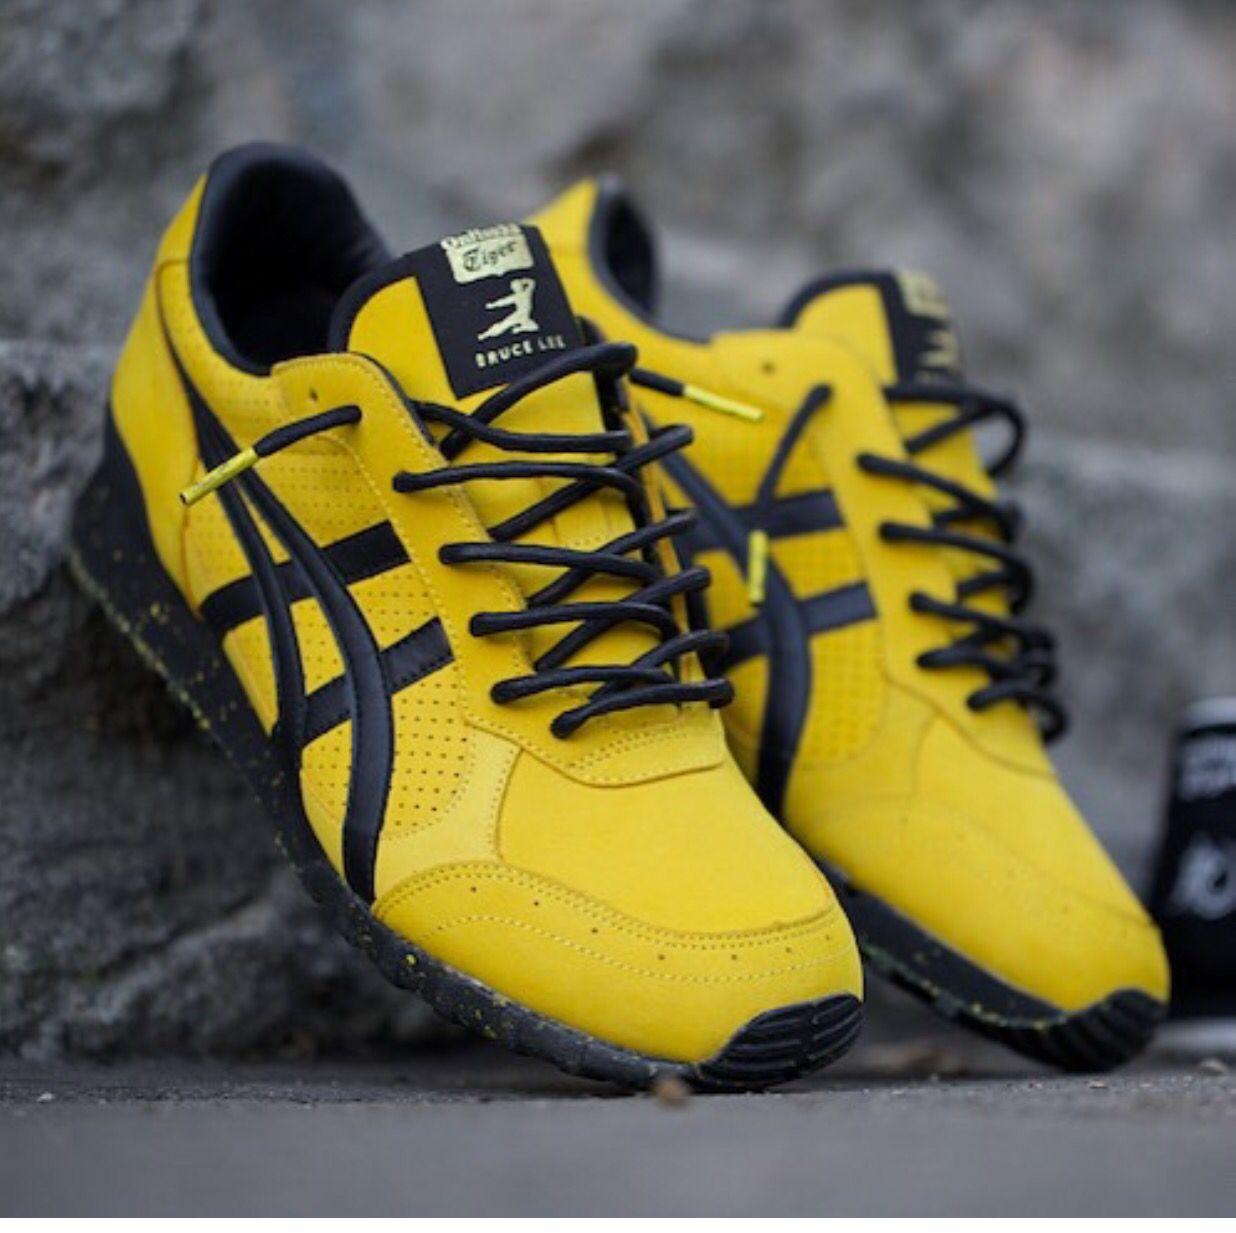 wholesale dealer 5260c de2ab Asics- Onitsuka Tiger - Bruce Lee edition | Shoes in 2019 ...